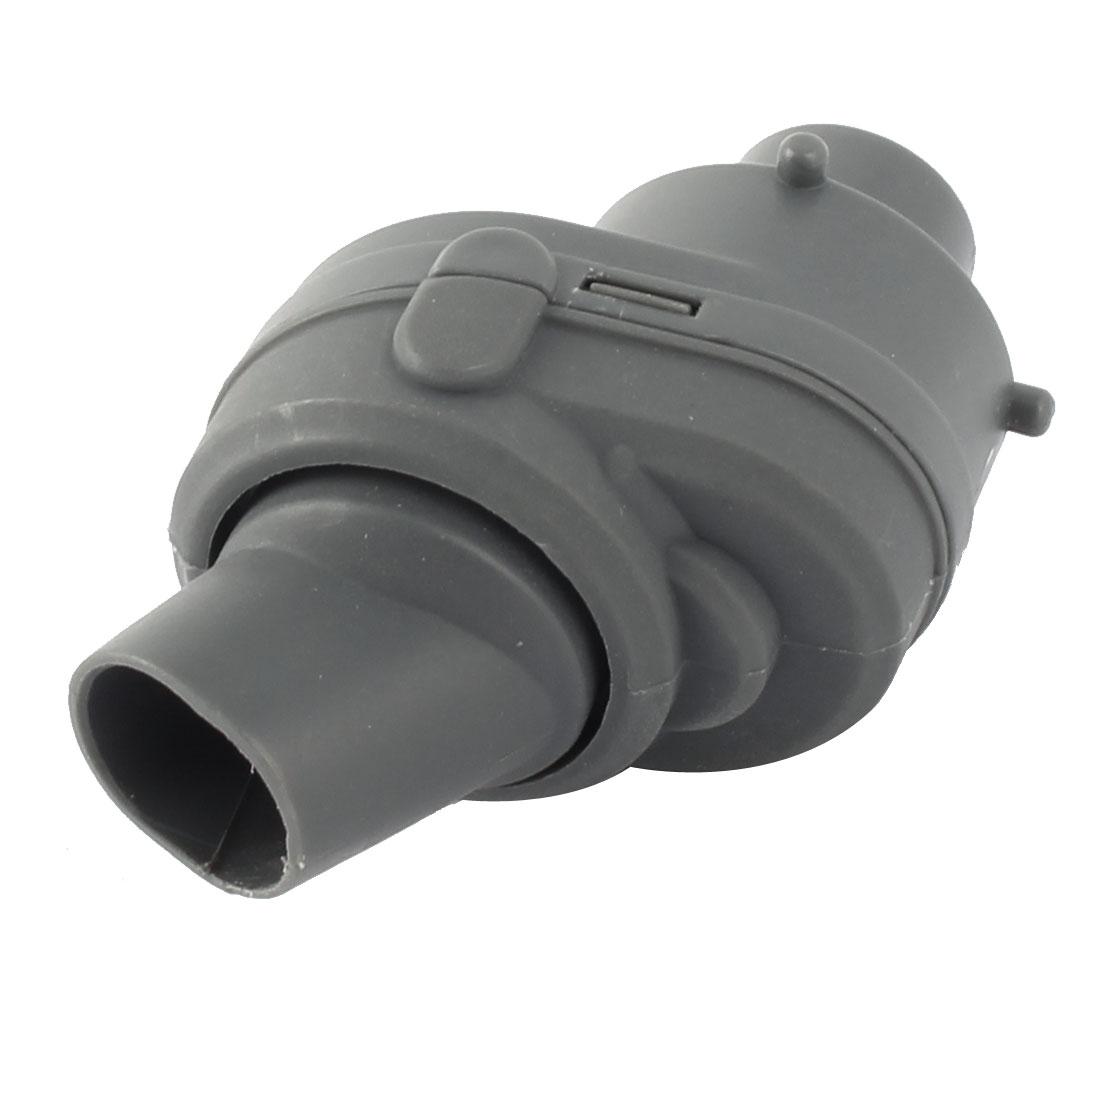 Aquarium Tank Plastic Universal Water 360 Degree Spin Rotating Nozzle Gray